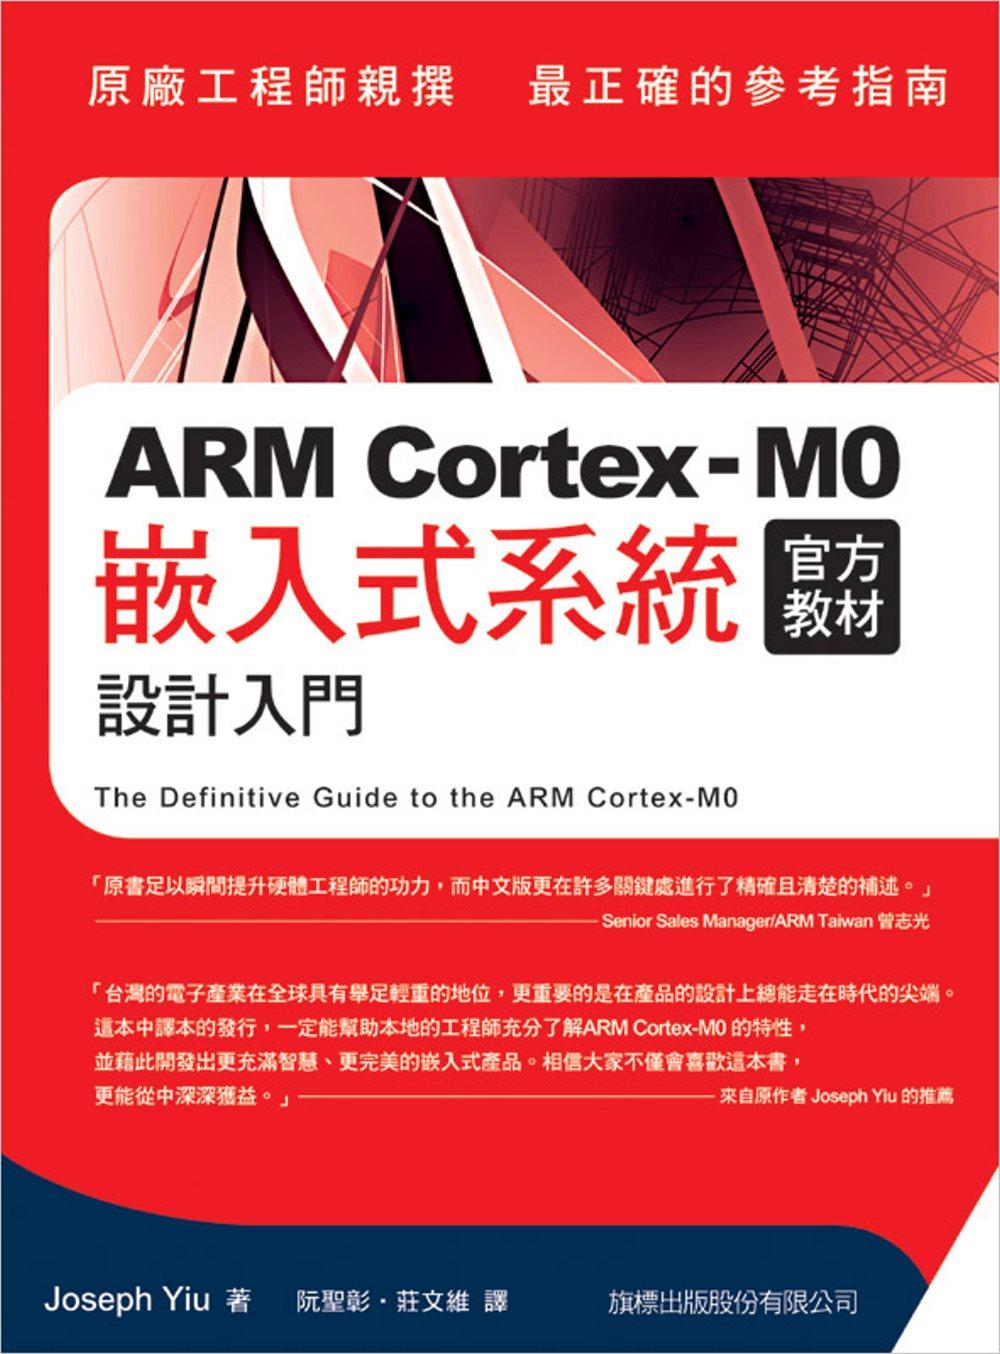 ARM Cortex-M0 官方教材:嵌入式系統設計入門